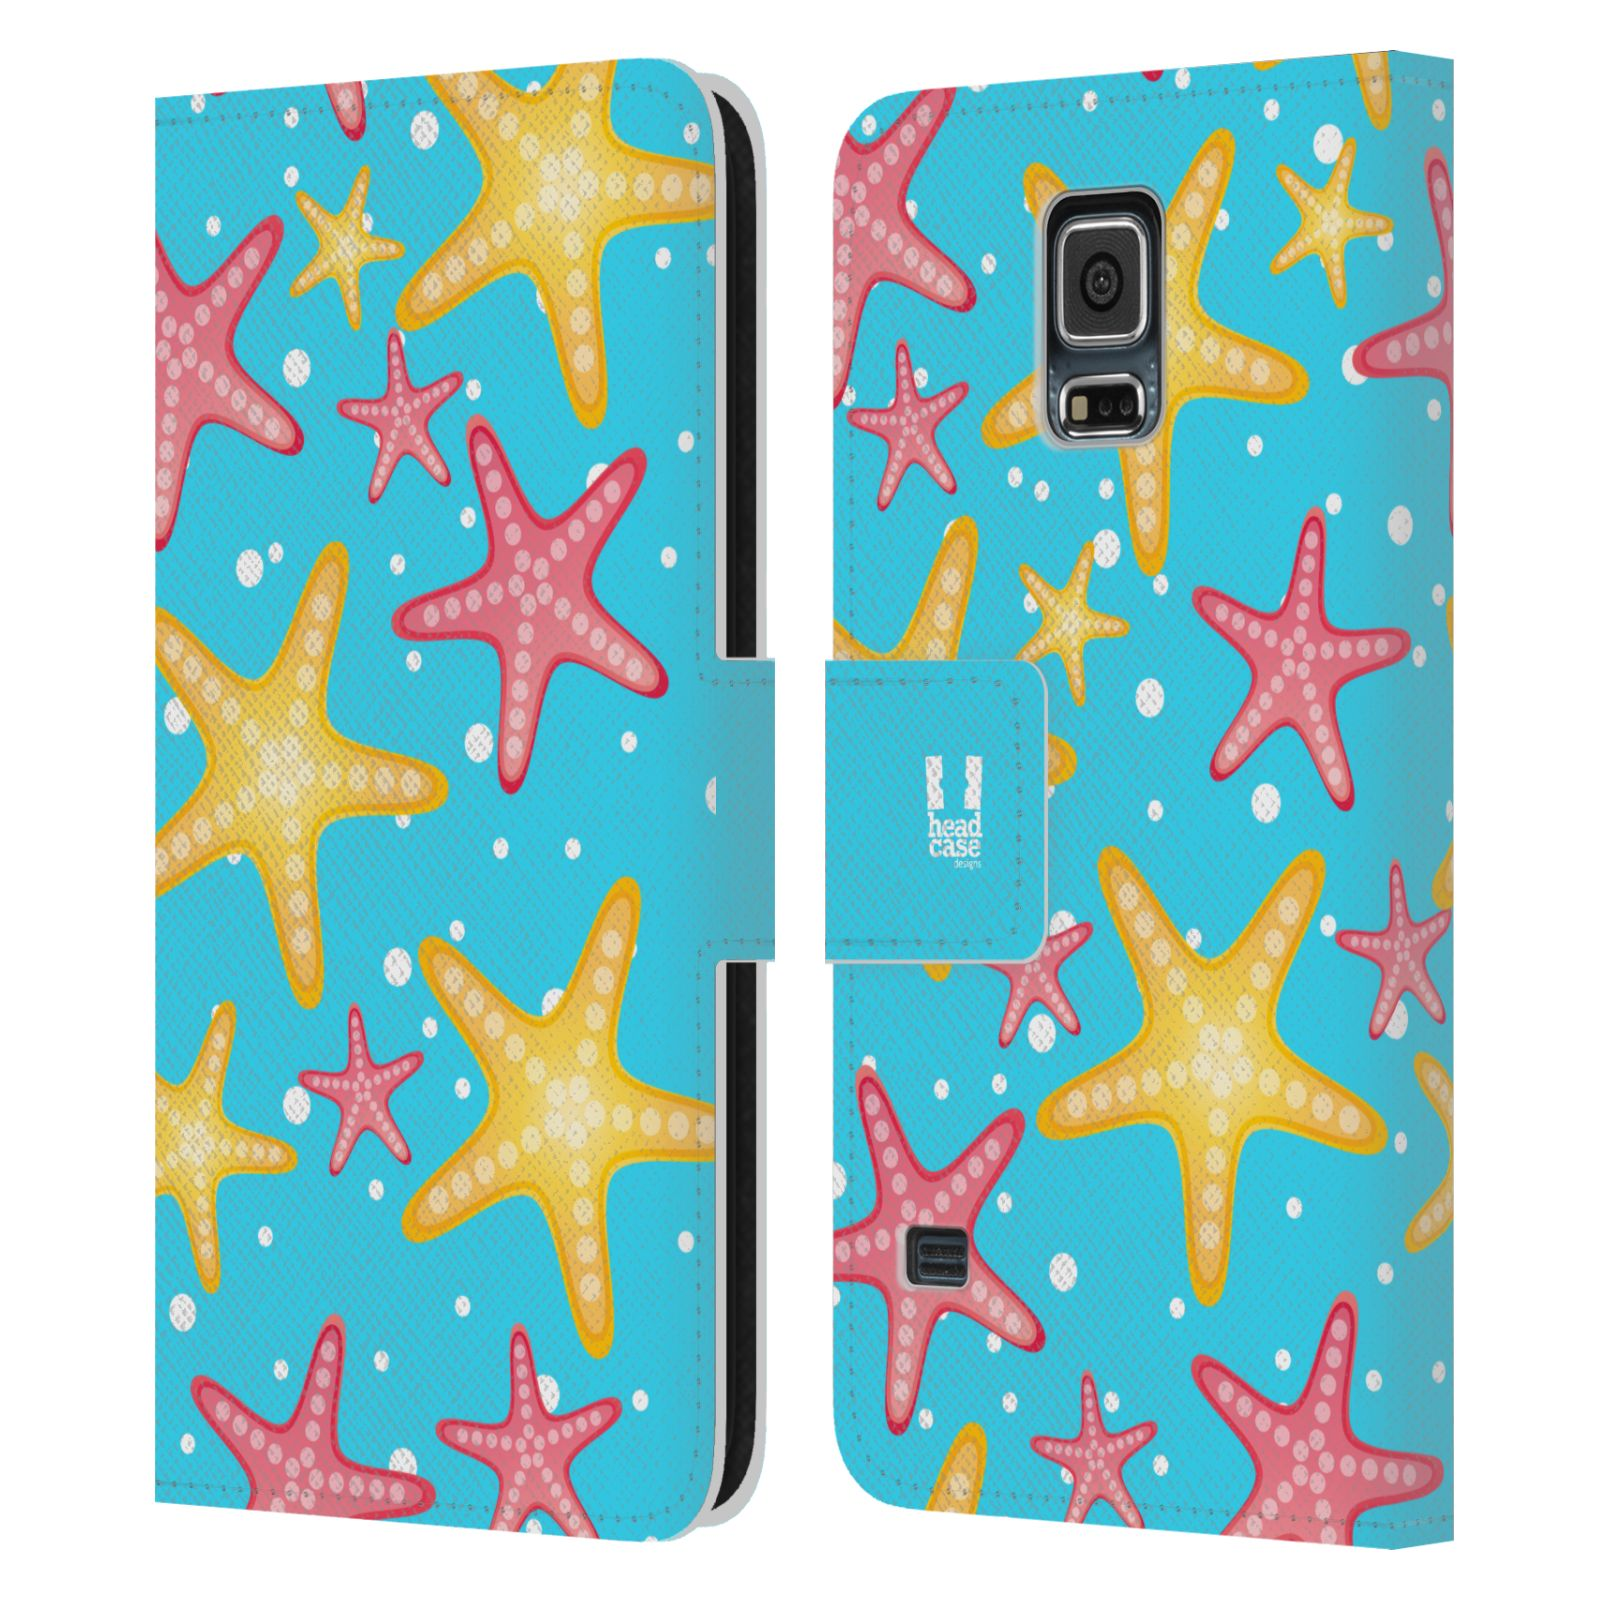 HEAD CASE Flipové pouzdro pro mobil Samsung Galaxy S5 / S5 NEO Mořský živočich hvězdice modrá barva pozadí